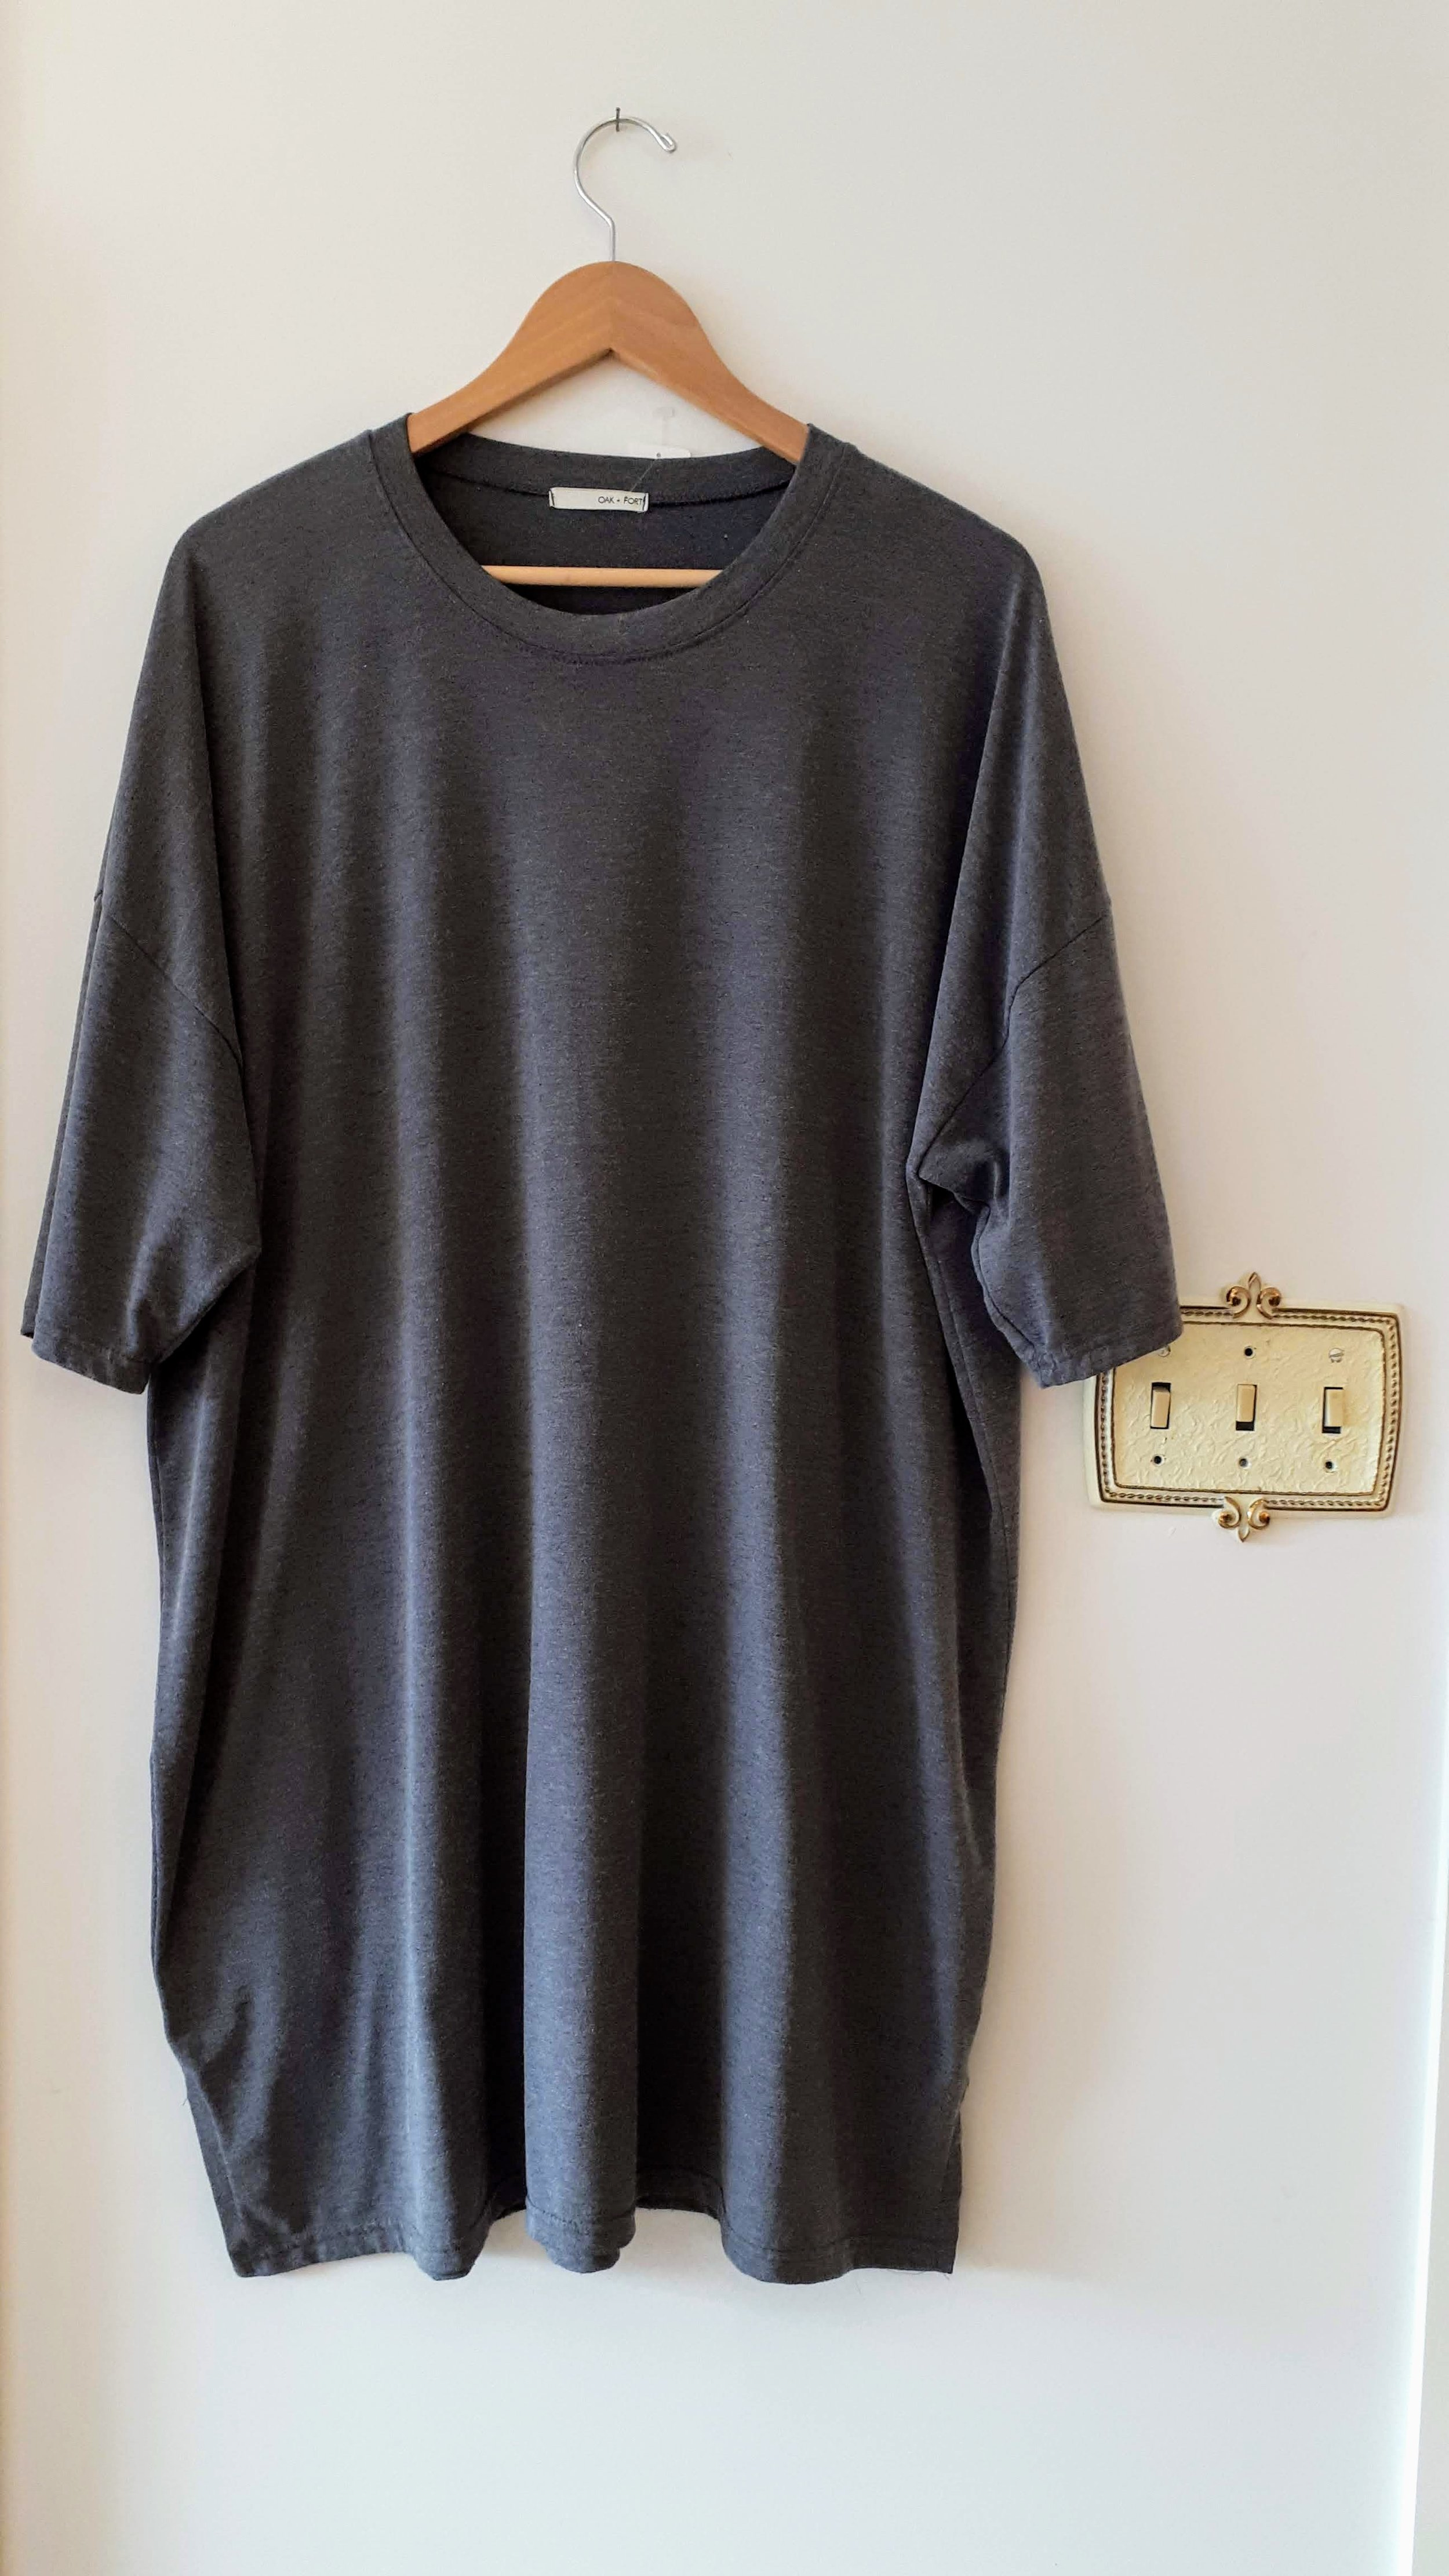 Oak+Fort dress; Size M, $52